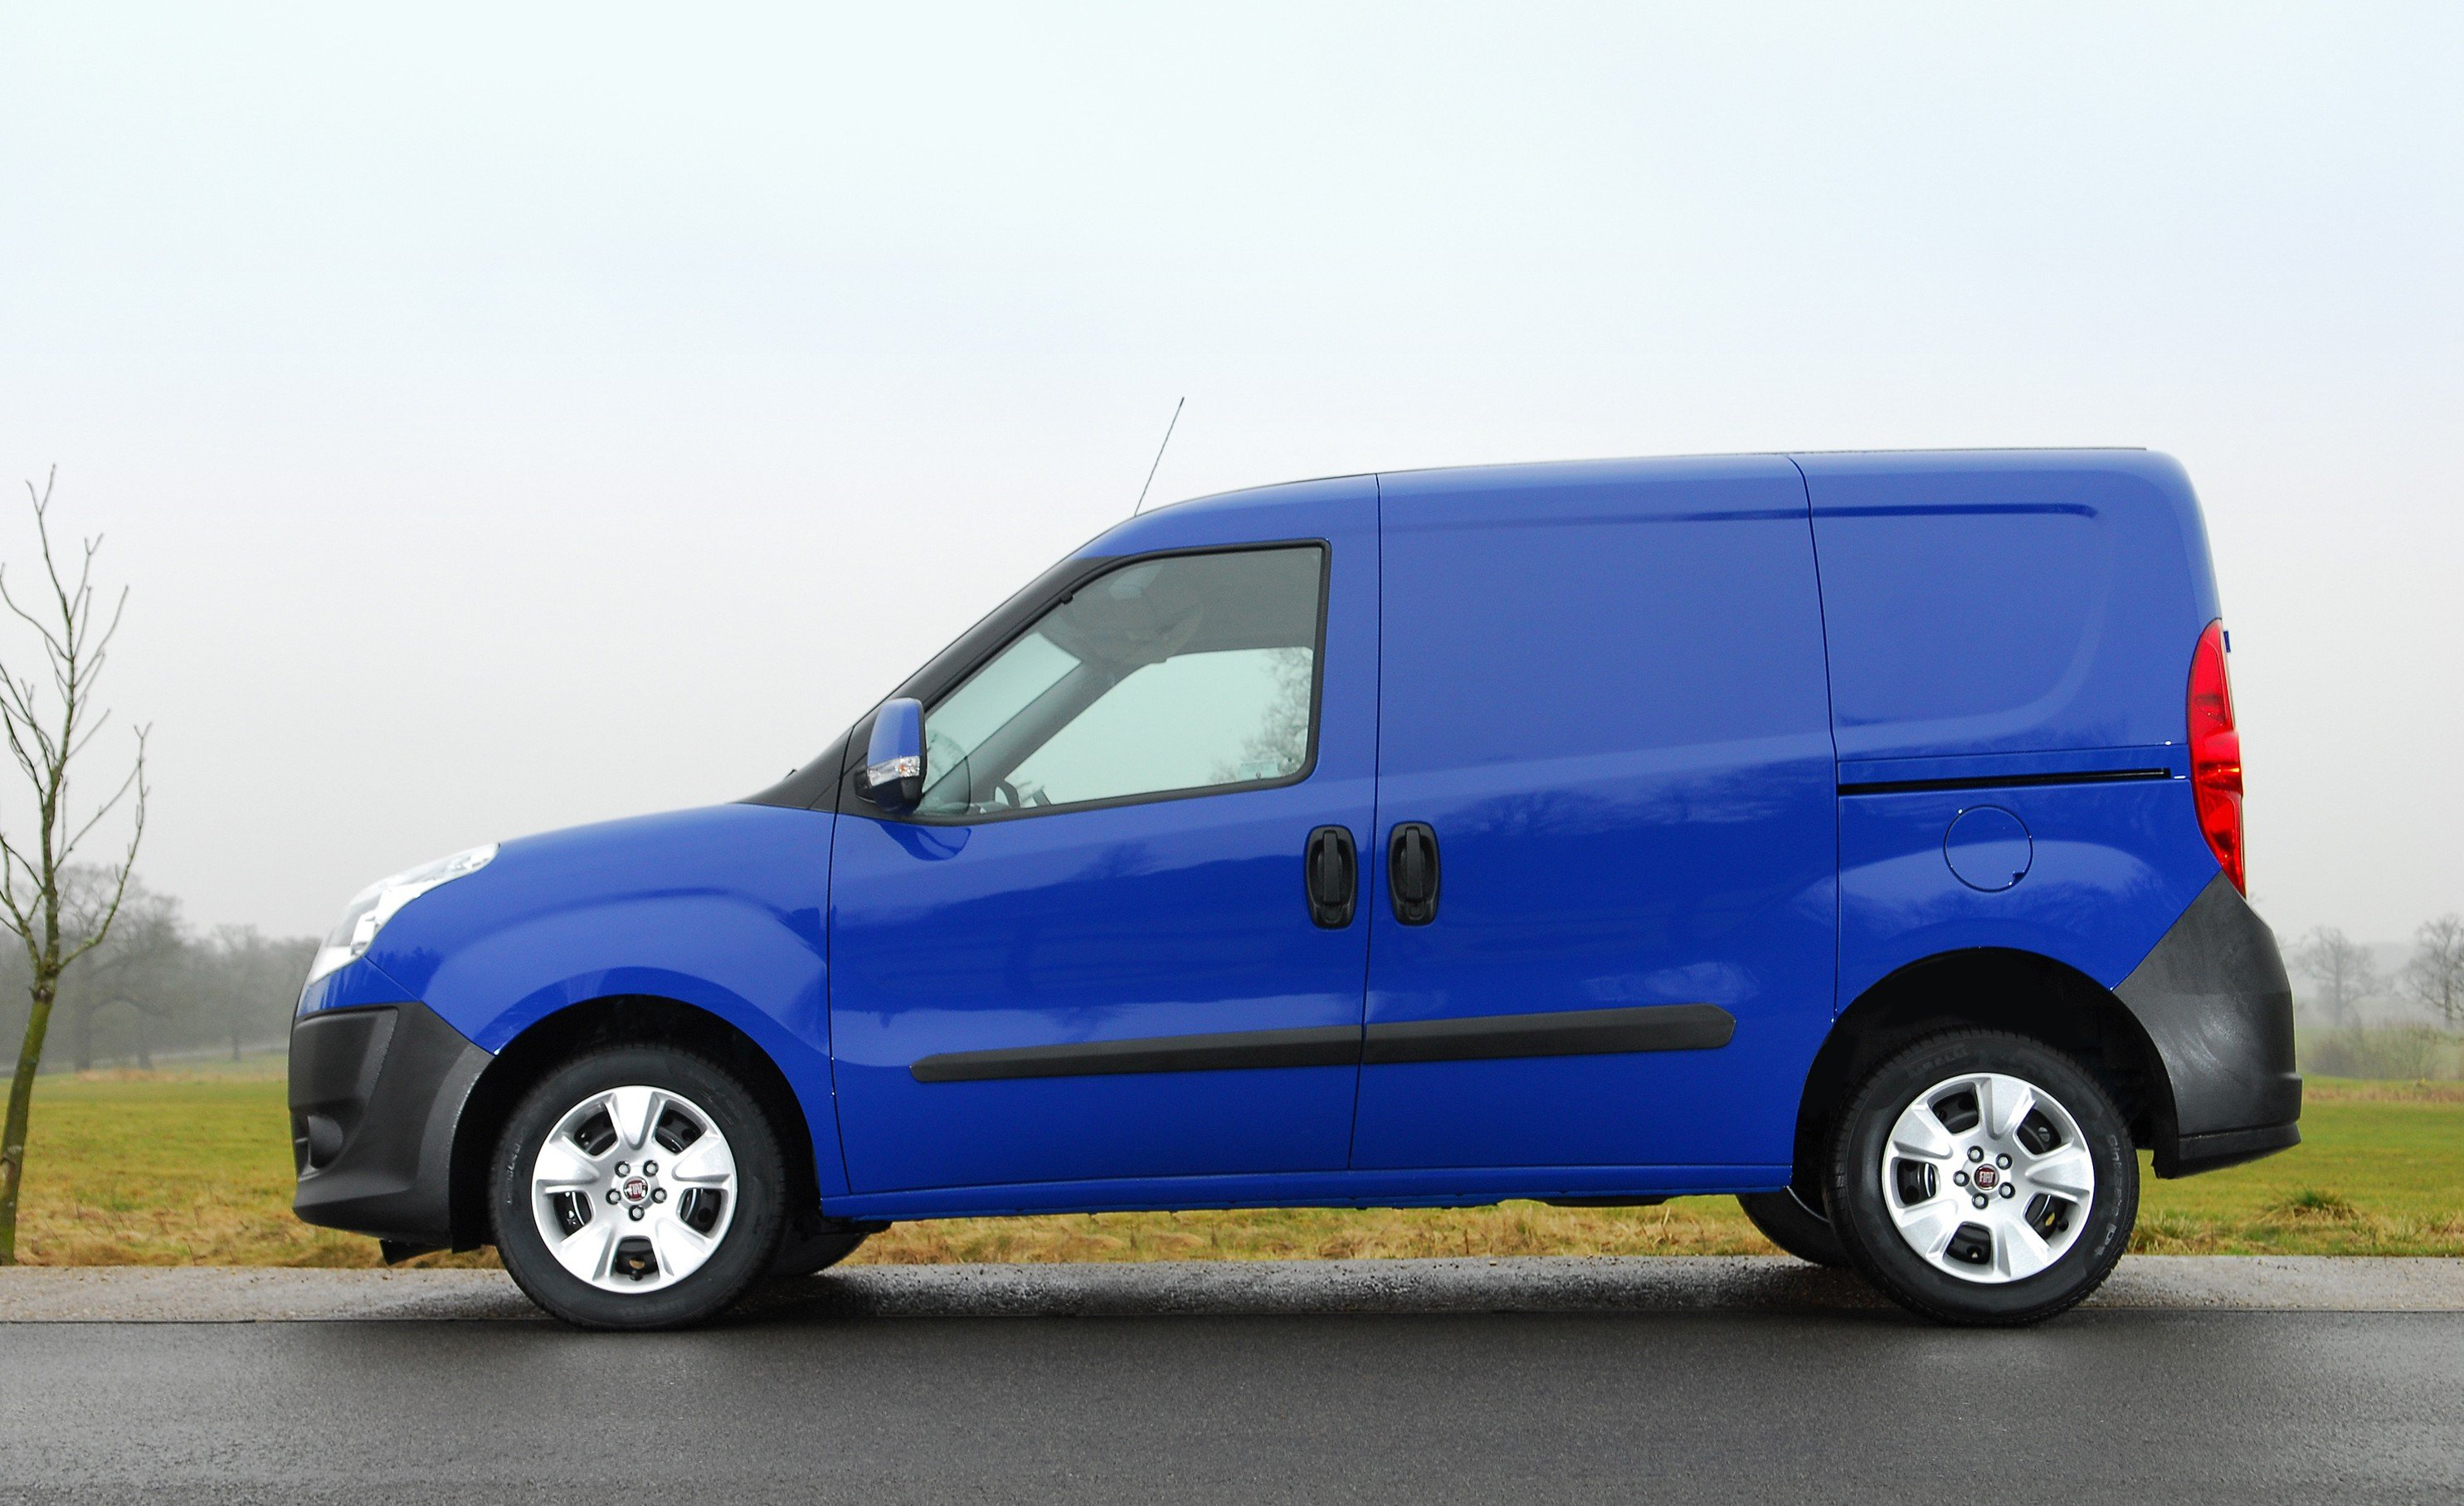 fiat doblo small van arrives from 22k photos 1 of 5. Black Bedroom Furniture Sets. Home Design Ideas